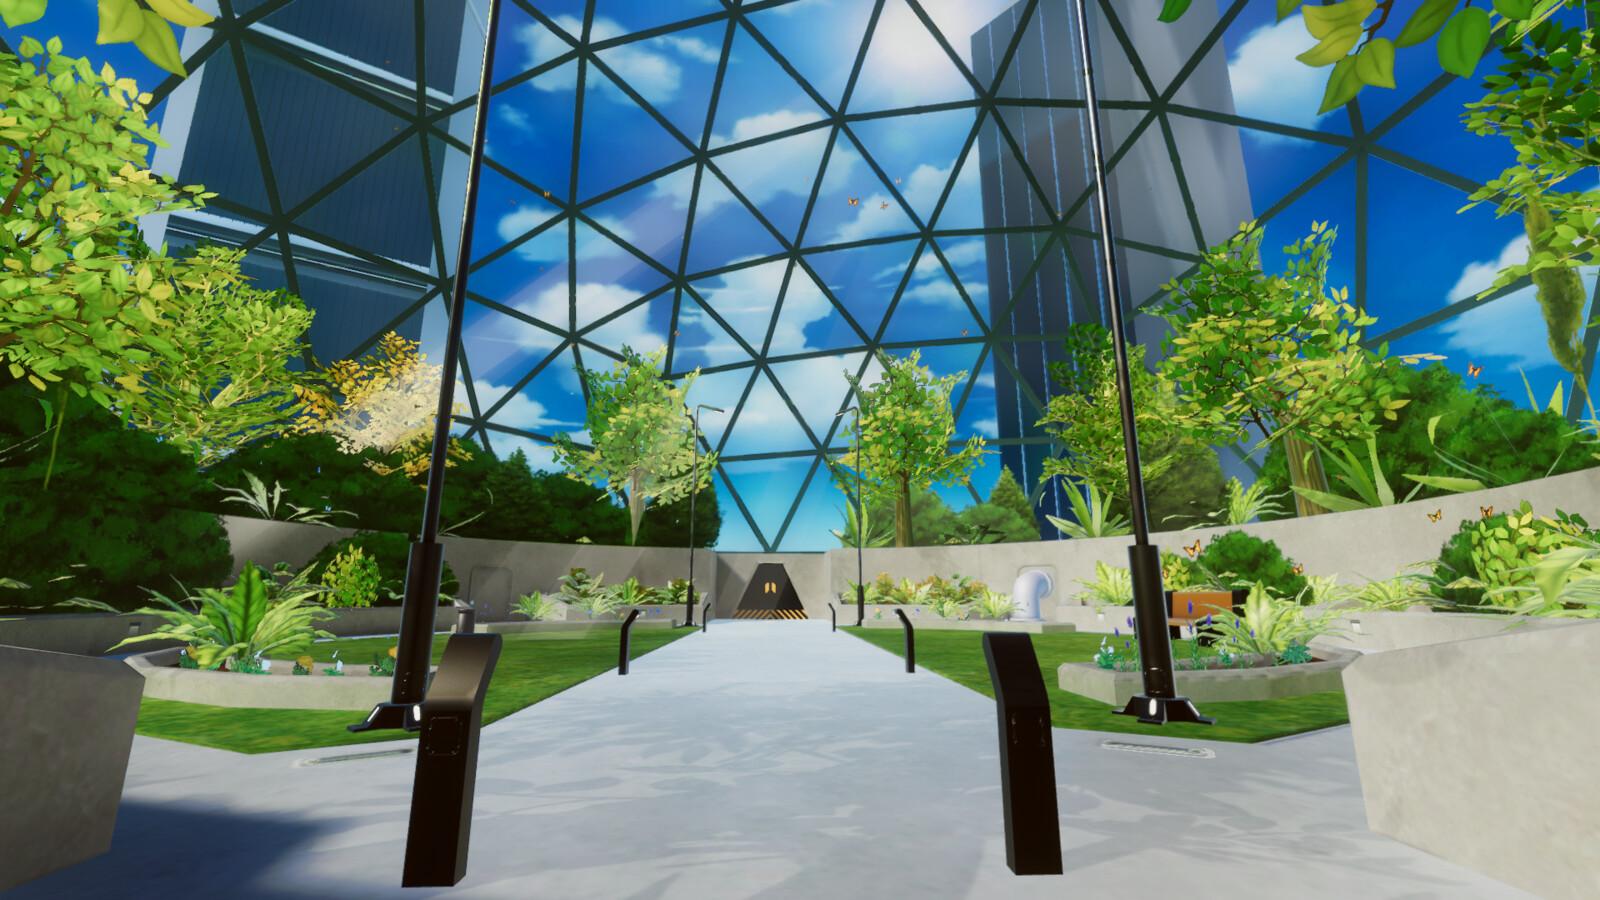 VR mobile stylized enviro dome park 5